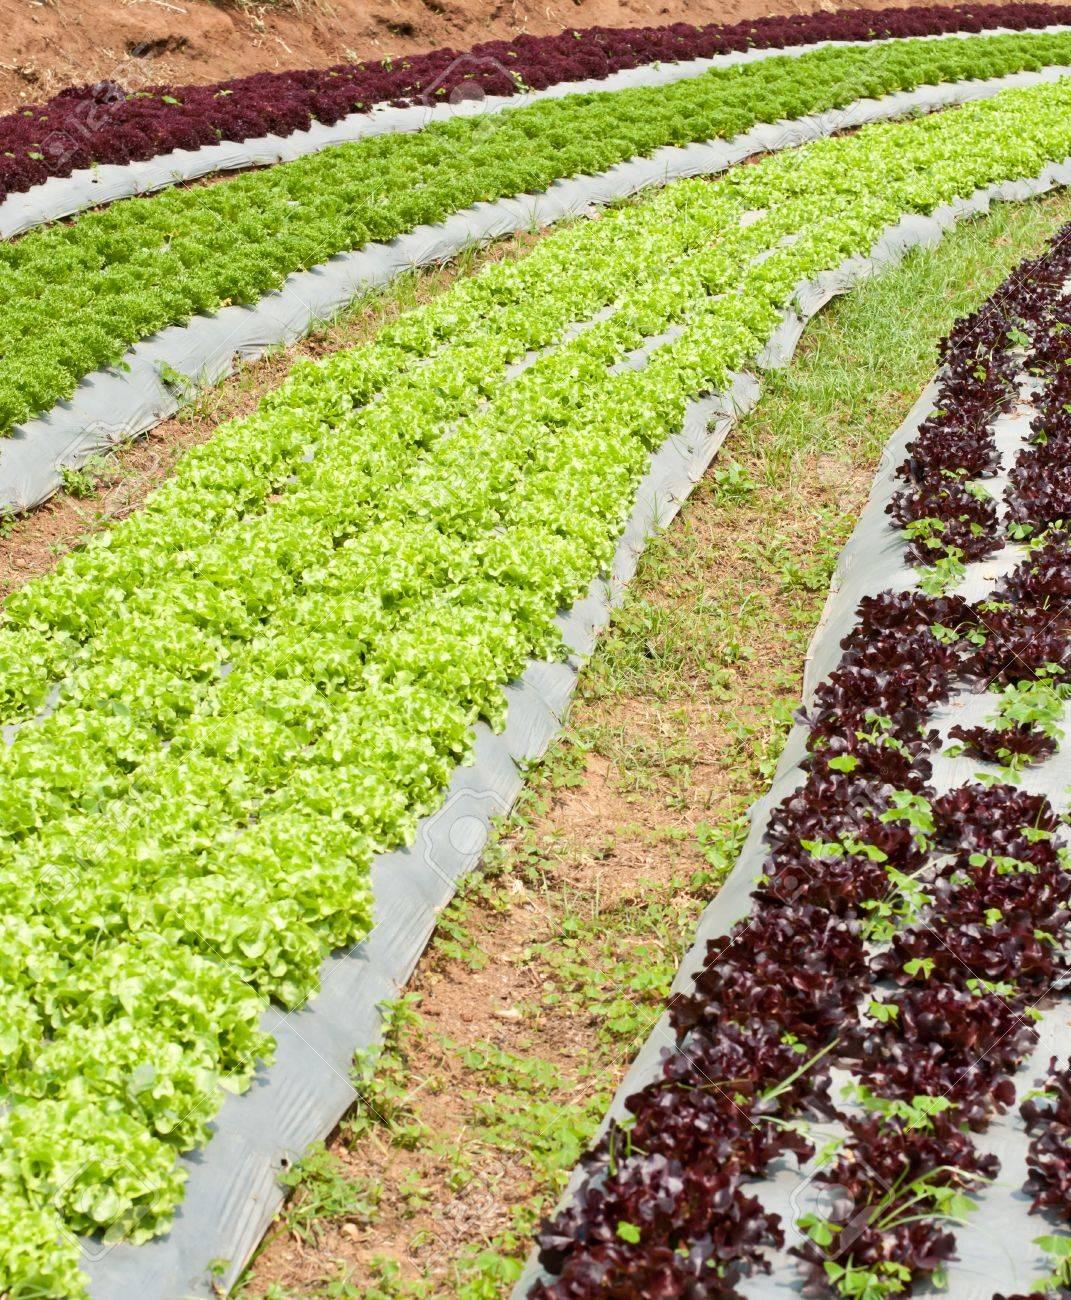 Vegetable garden rows - Growing Lettuce In Rows In The Vegetable Garden Stock Photo 12933334